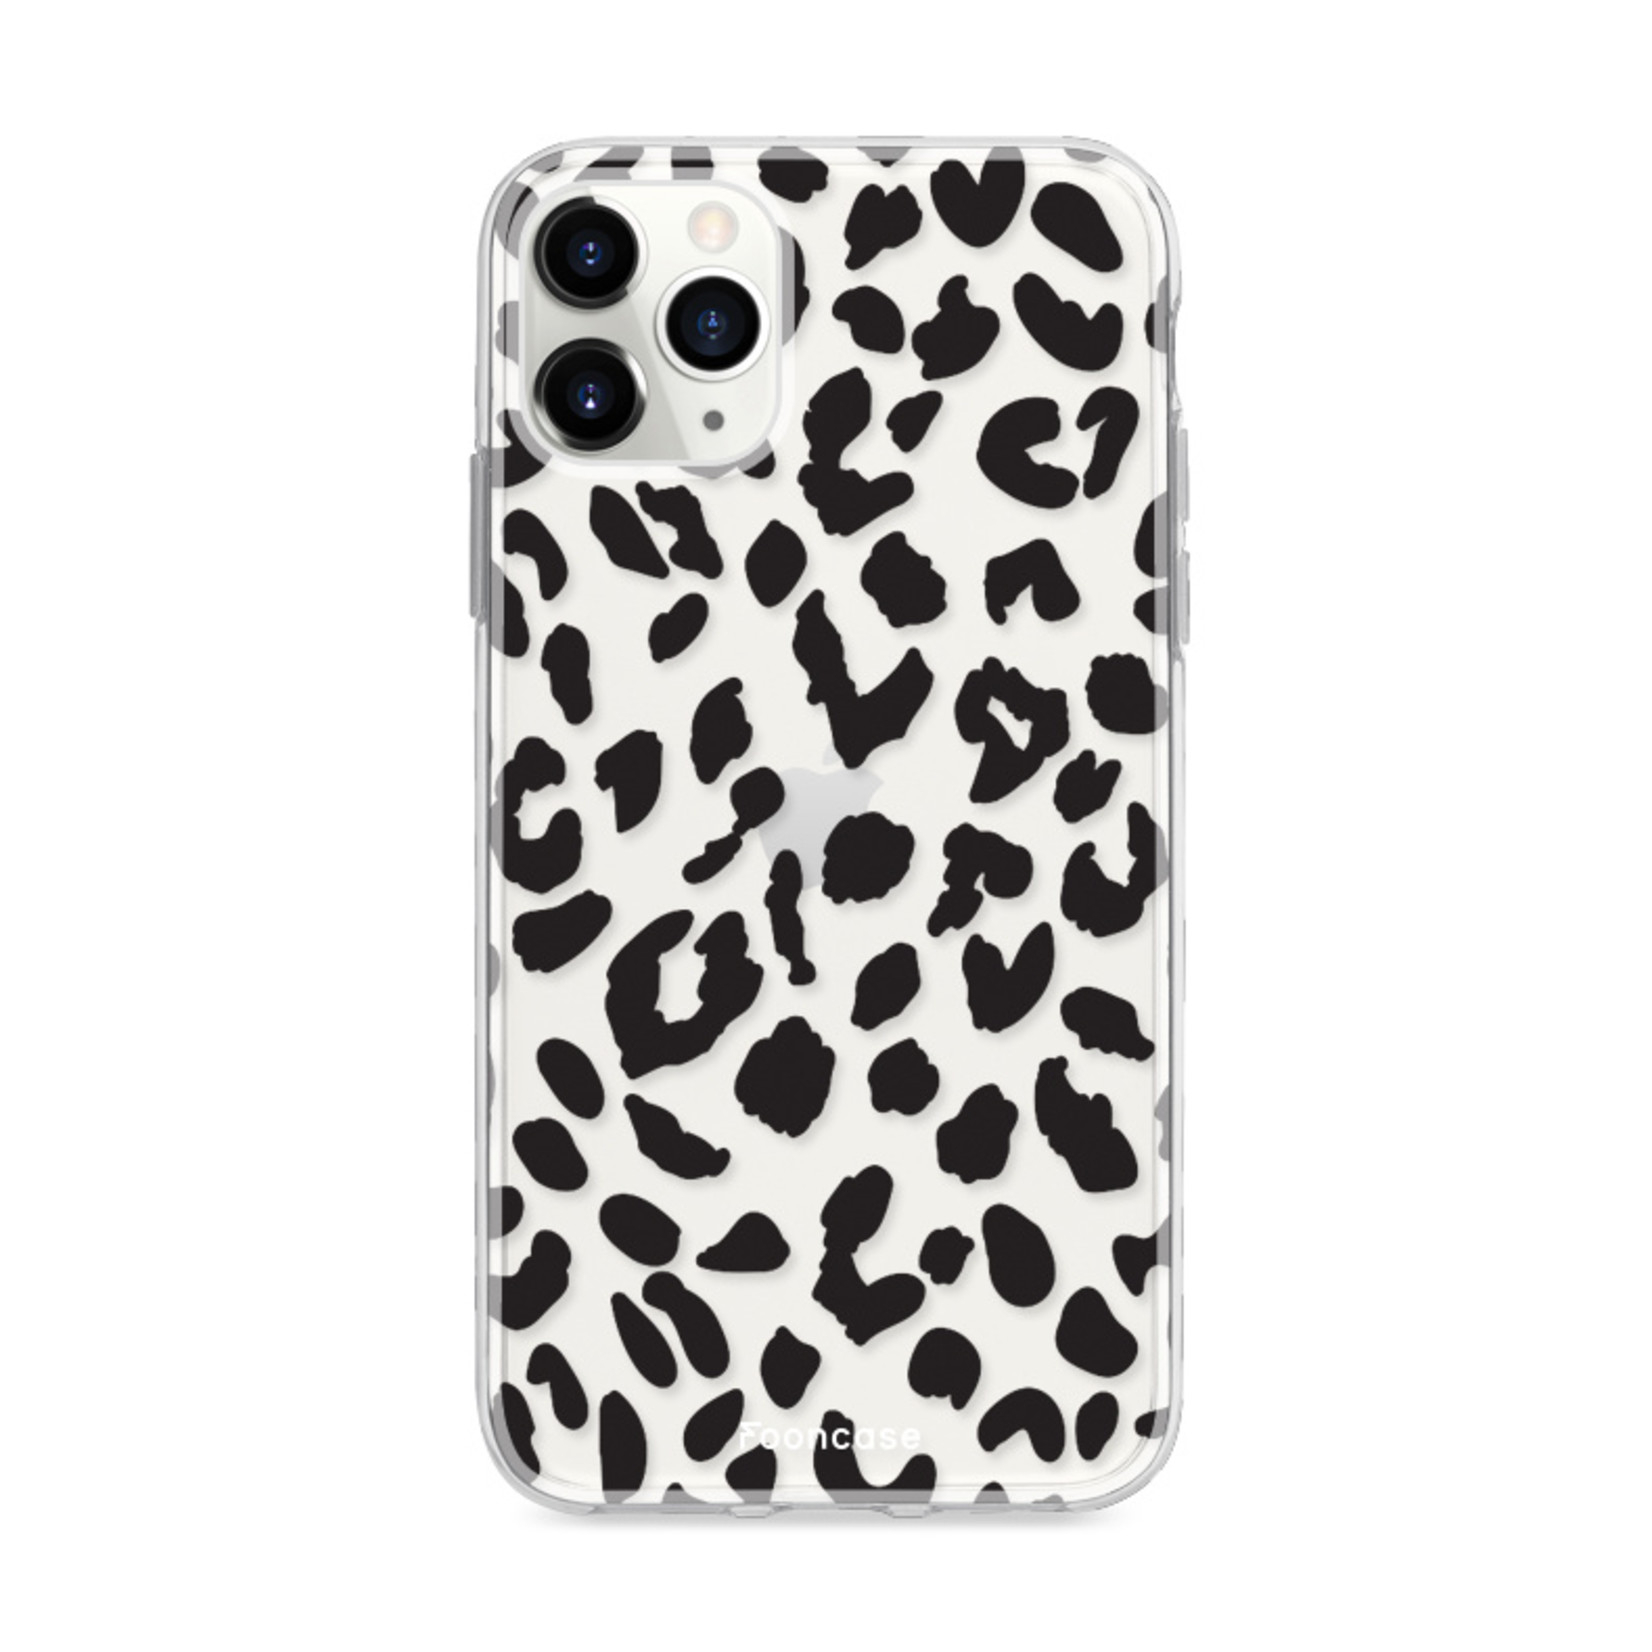 FOONCASE iPhone 11 Pro hoesje TPU Soft Case - Back Cover - Luipaard / Leopard print